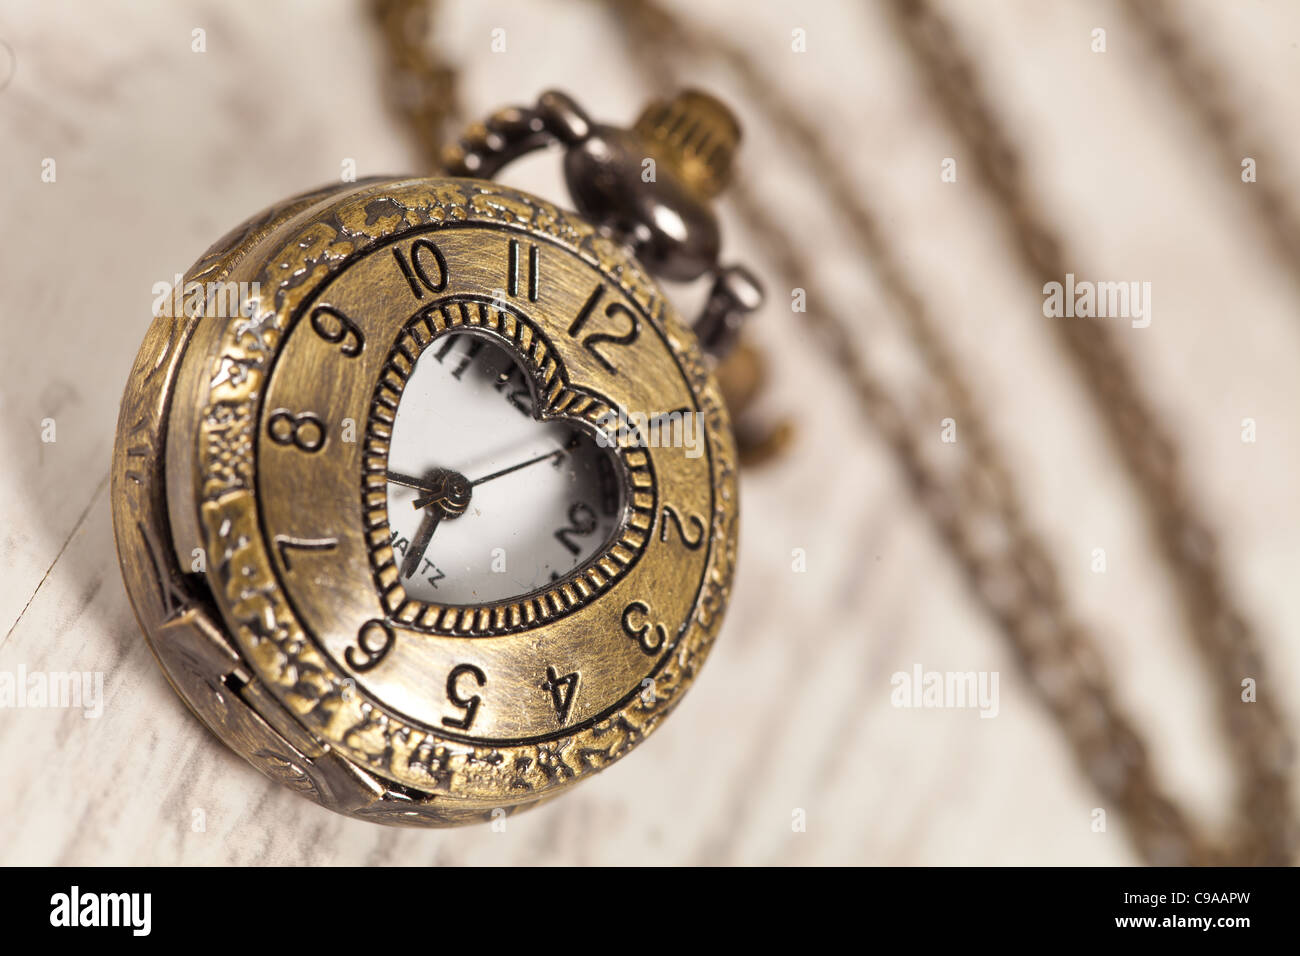 Nice vintage pocket watch on wooden background - Stock Image